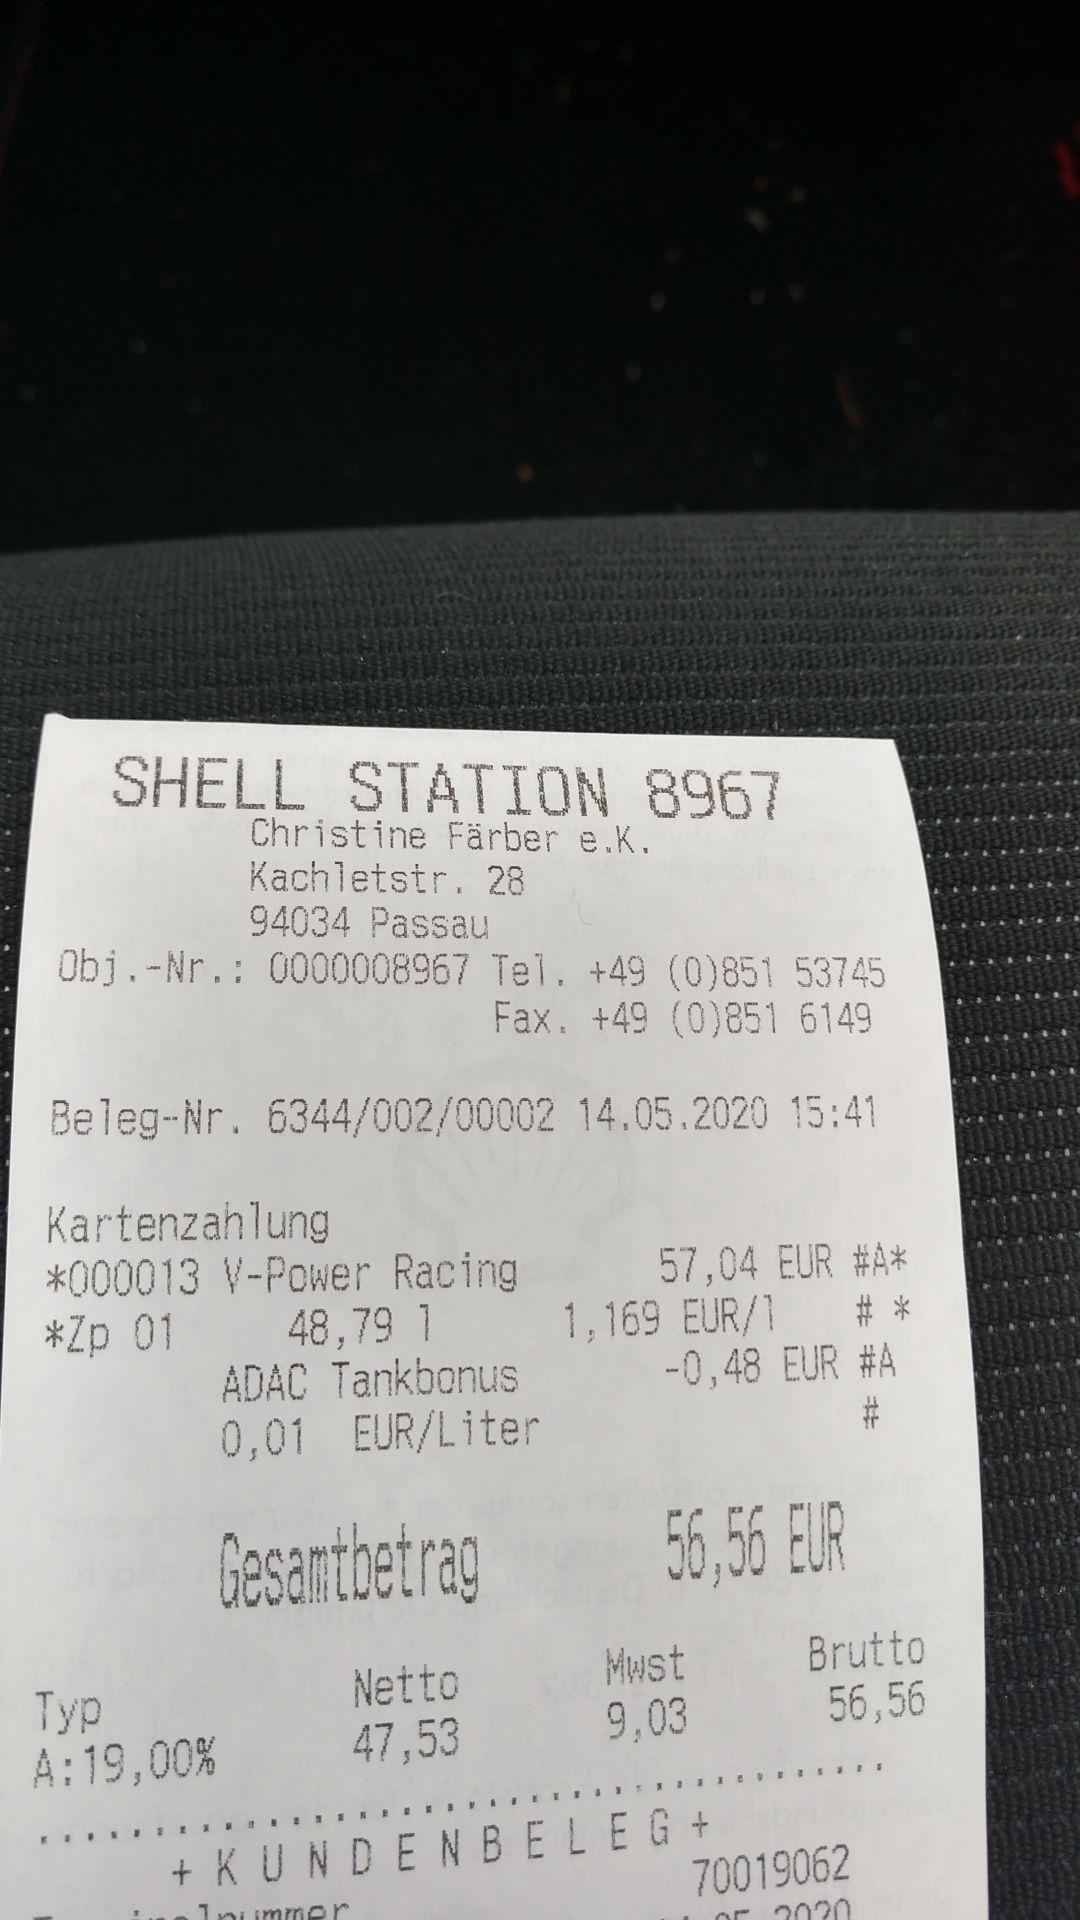 [Lokal] Shell Passau V-Power Racing 100 zum gleichen Preis wie 95 E5